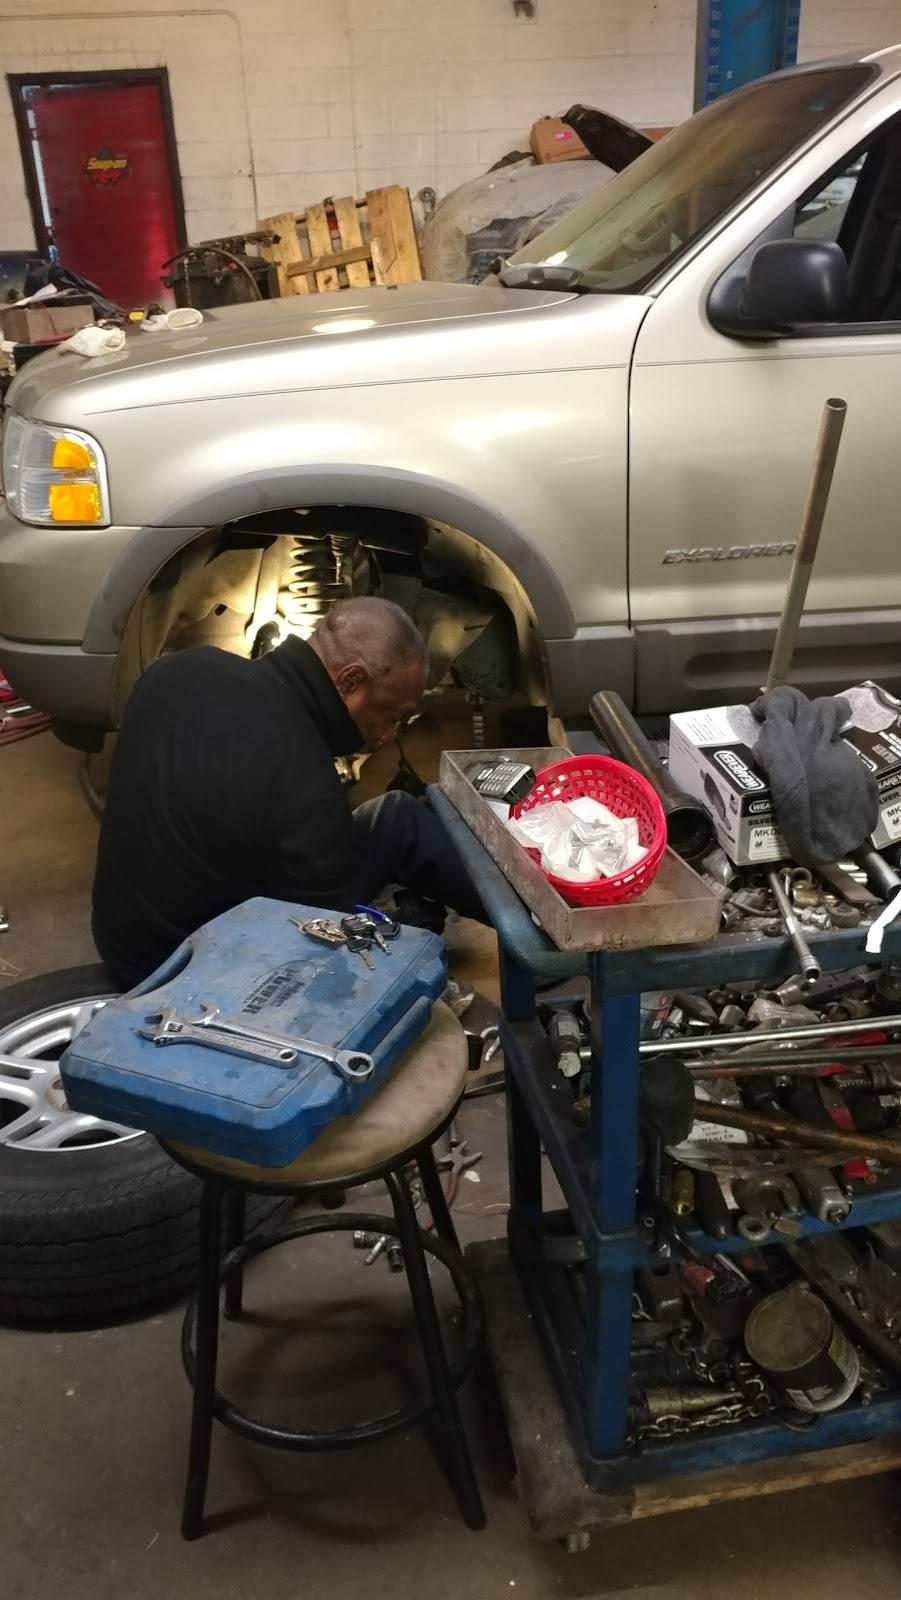 Jm Auto Repair Inc - car repair    Photo 3 of 17   Address: 316 Rush St # 104, Raleigh, NC 27610, USA   Phone: (919) 833-6988